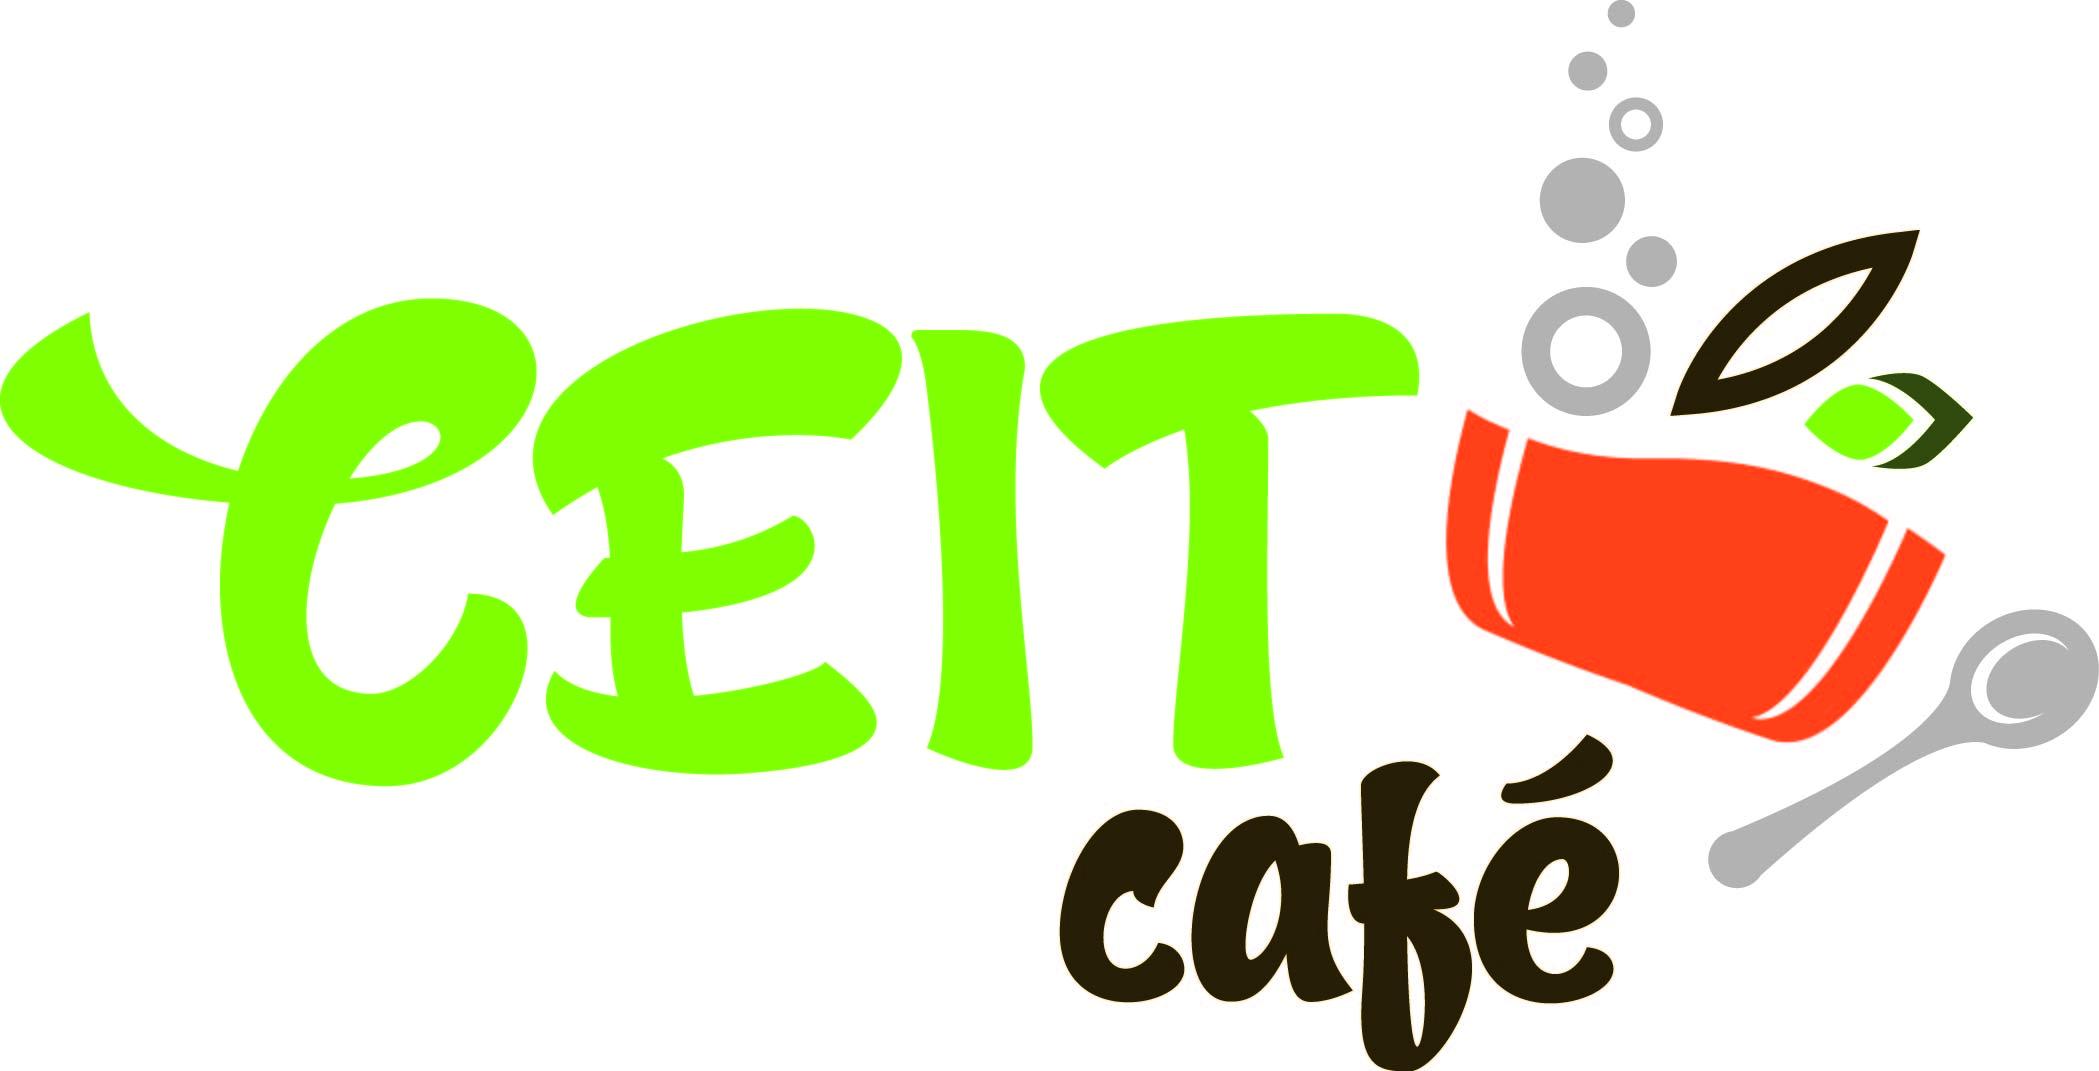 CEIT cafe logo